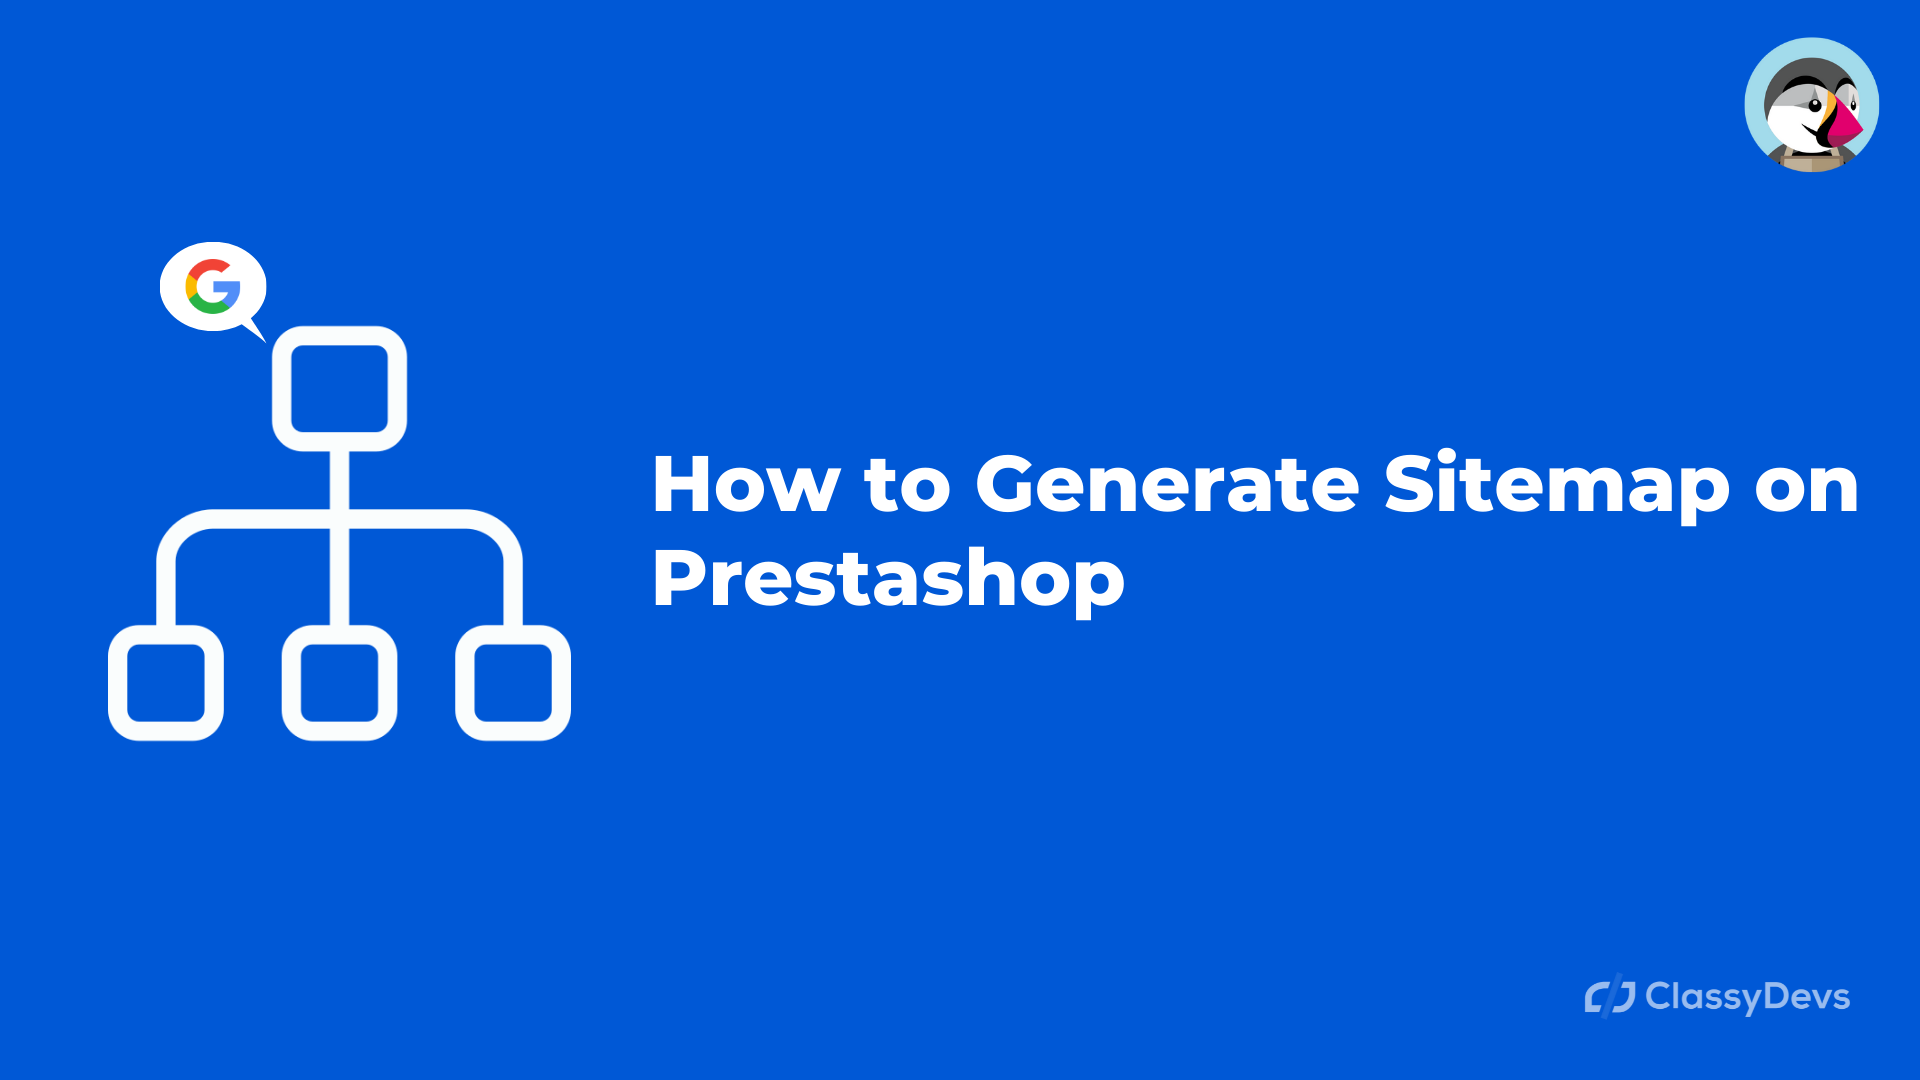 Generate Sitemap on Prestashop